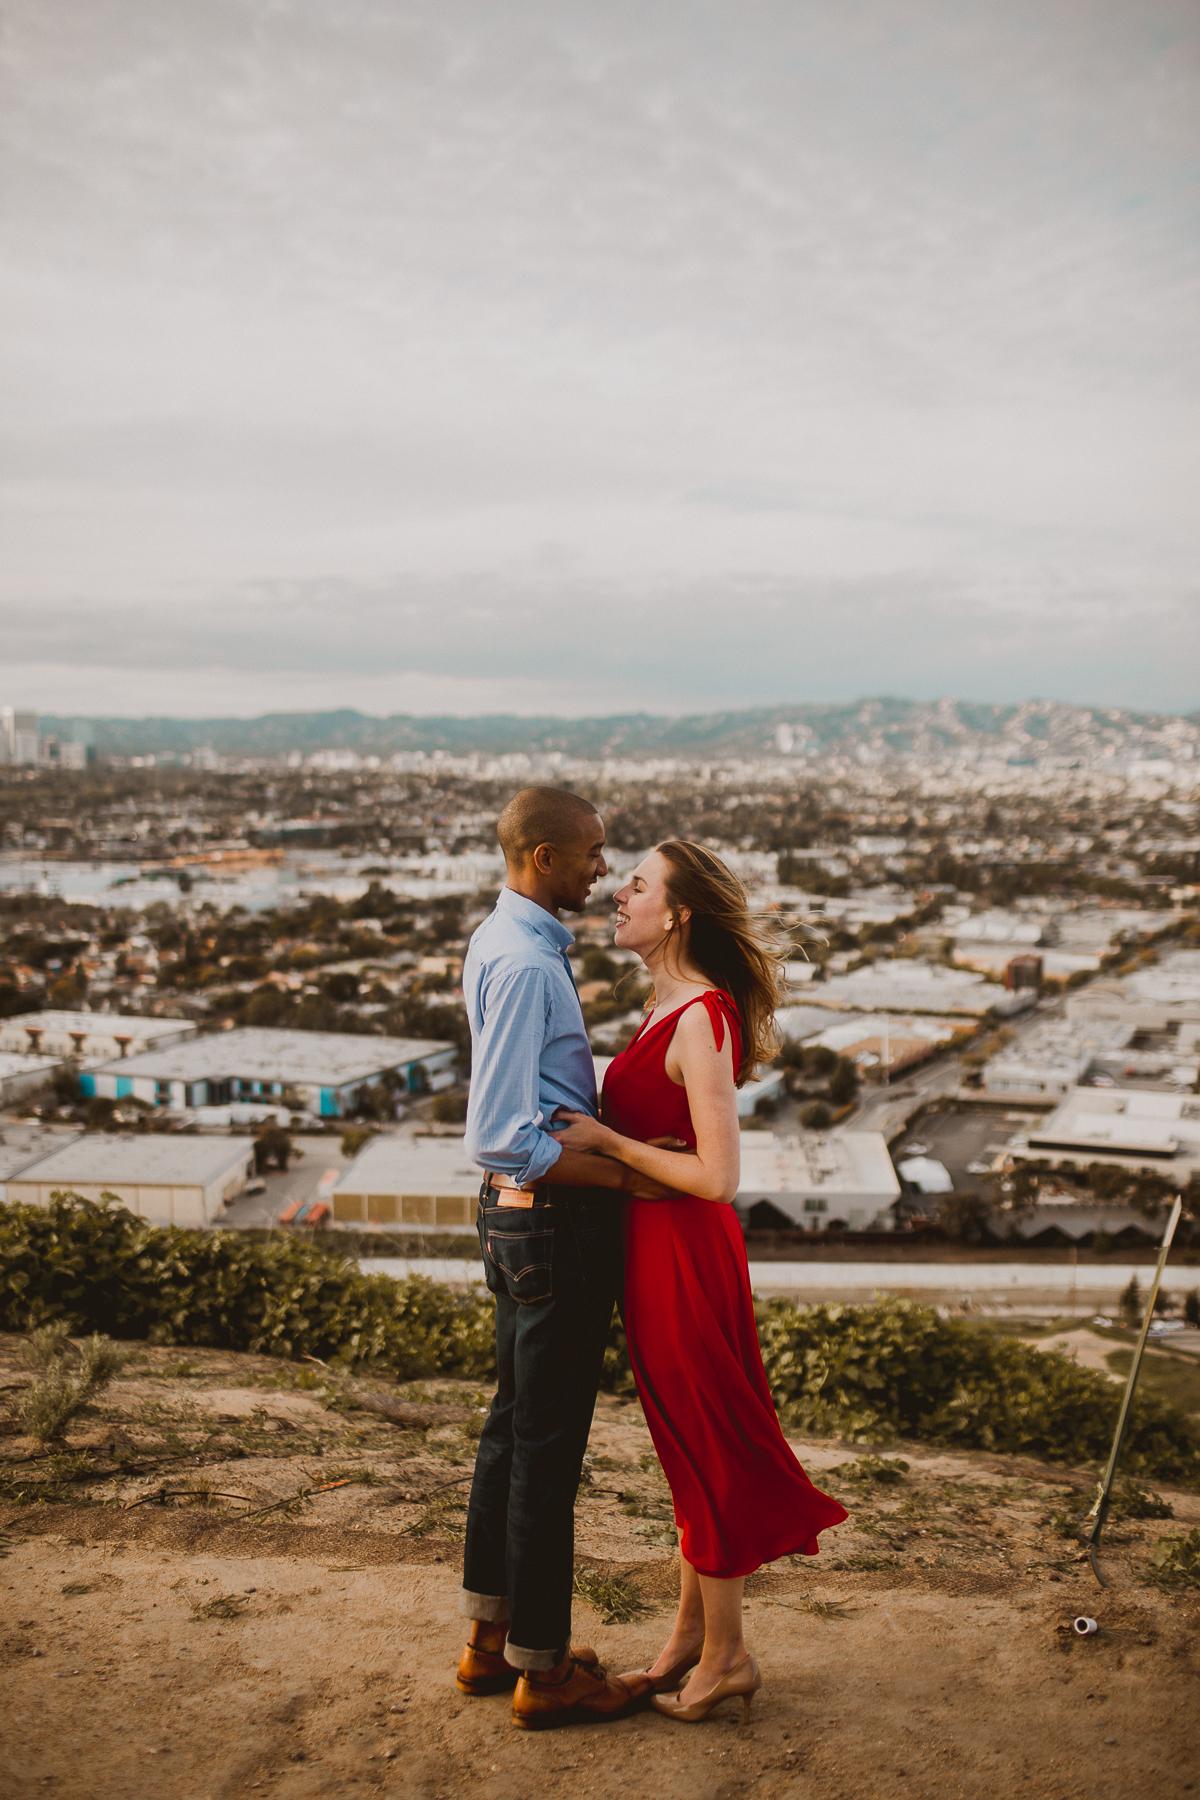 mar-vista-baldwin-hills-scenic-overlook-engagement-kelley-raye-los-angeles-wedding-photographer-161.jpg